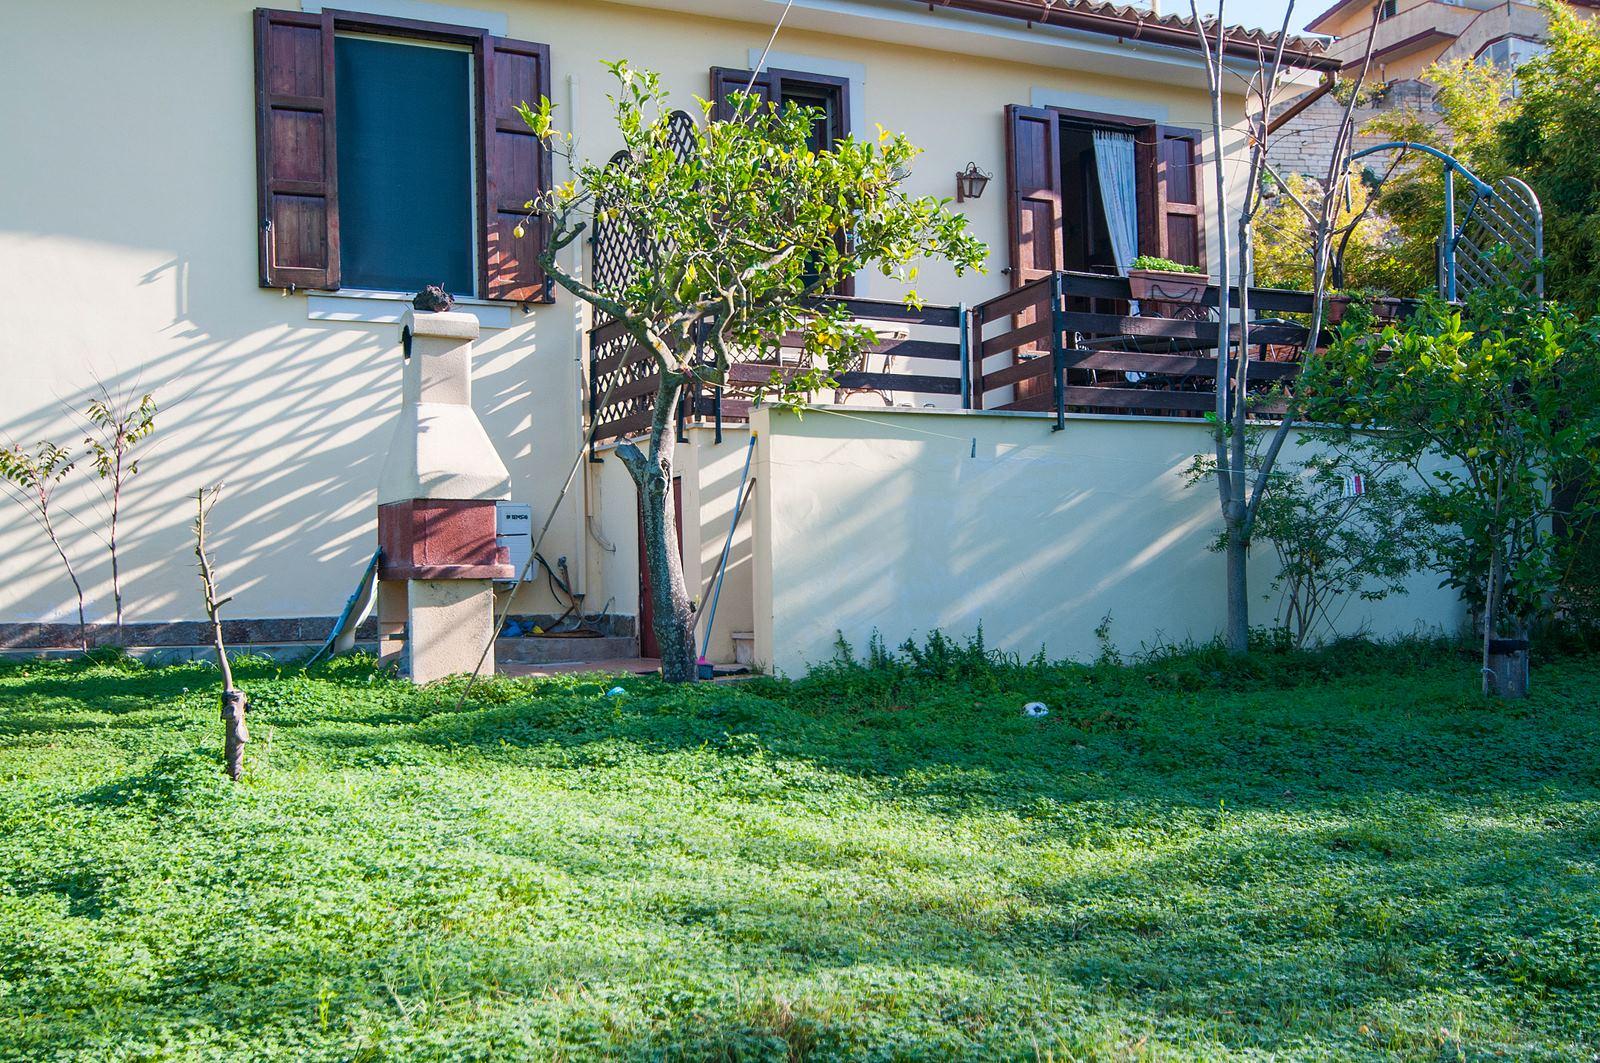 Maison de vacances Villetta a Lido (1540086), Lido di Noto, Siracusa, Sicile, Italie, image 13